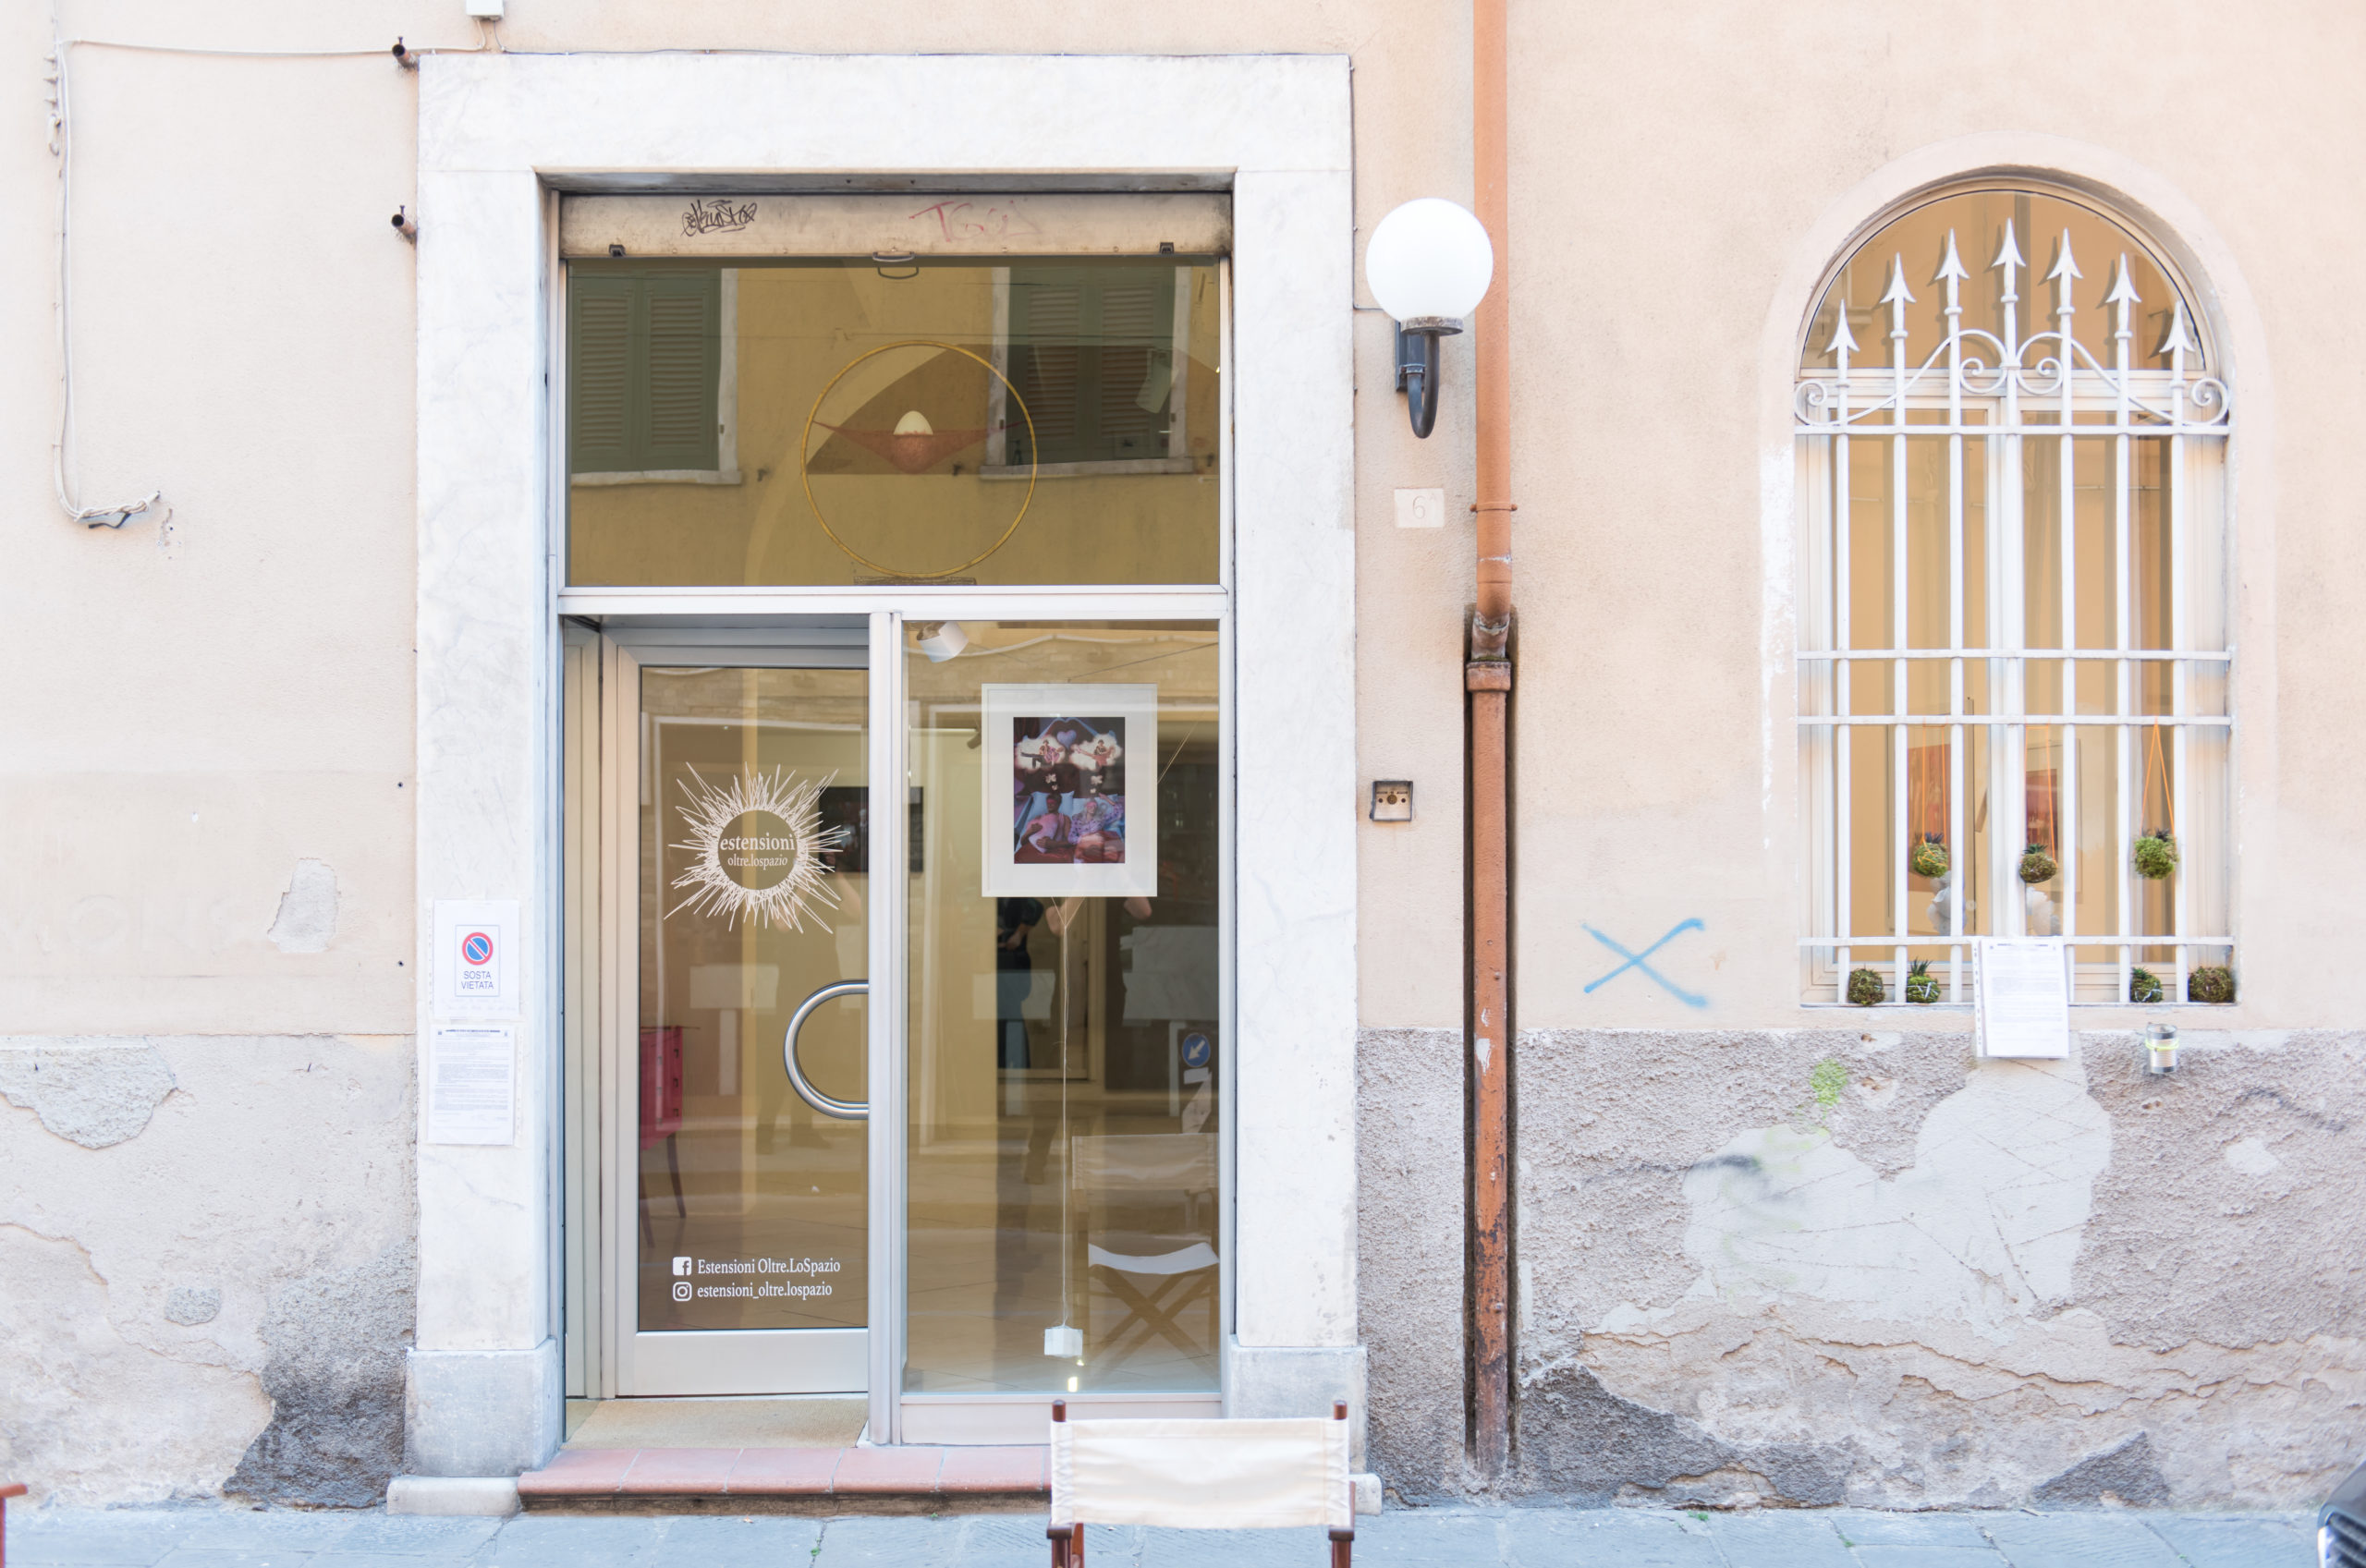 Dina Goldstein In The Dollhouse art photography exhibition ESTENSIONI OLTRE.LOSPAZIO Carrara Italy